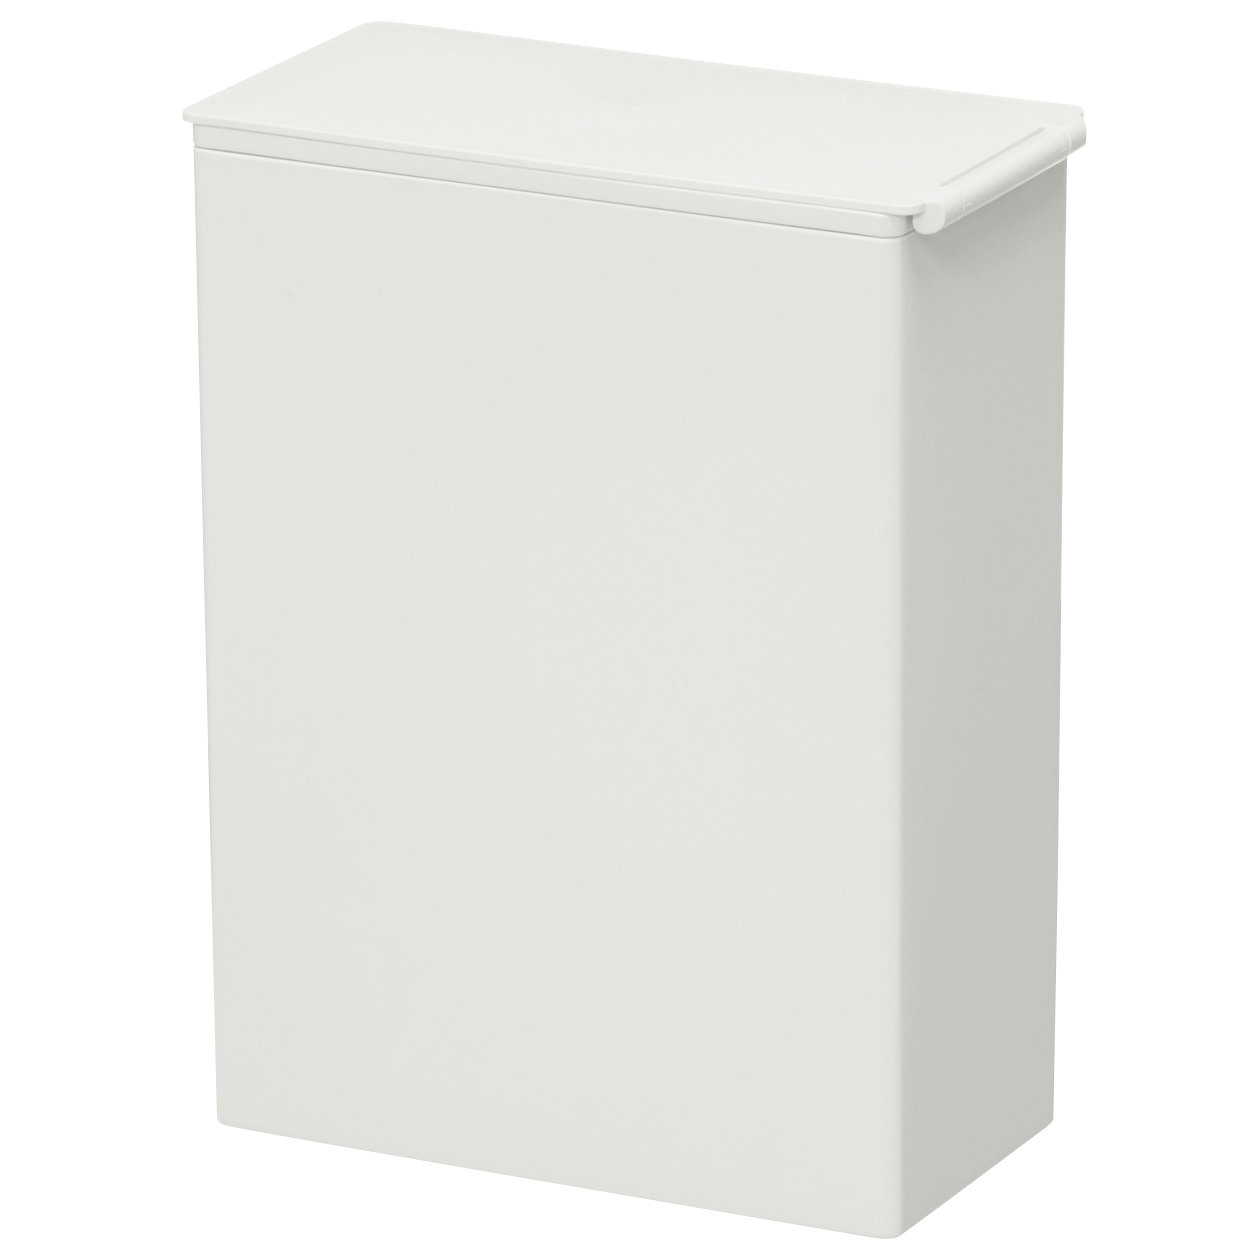 PP垃圾桶/方型/附框架/小/約3L 約寬10×深19.5×高20cm | 無印良品